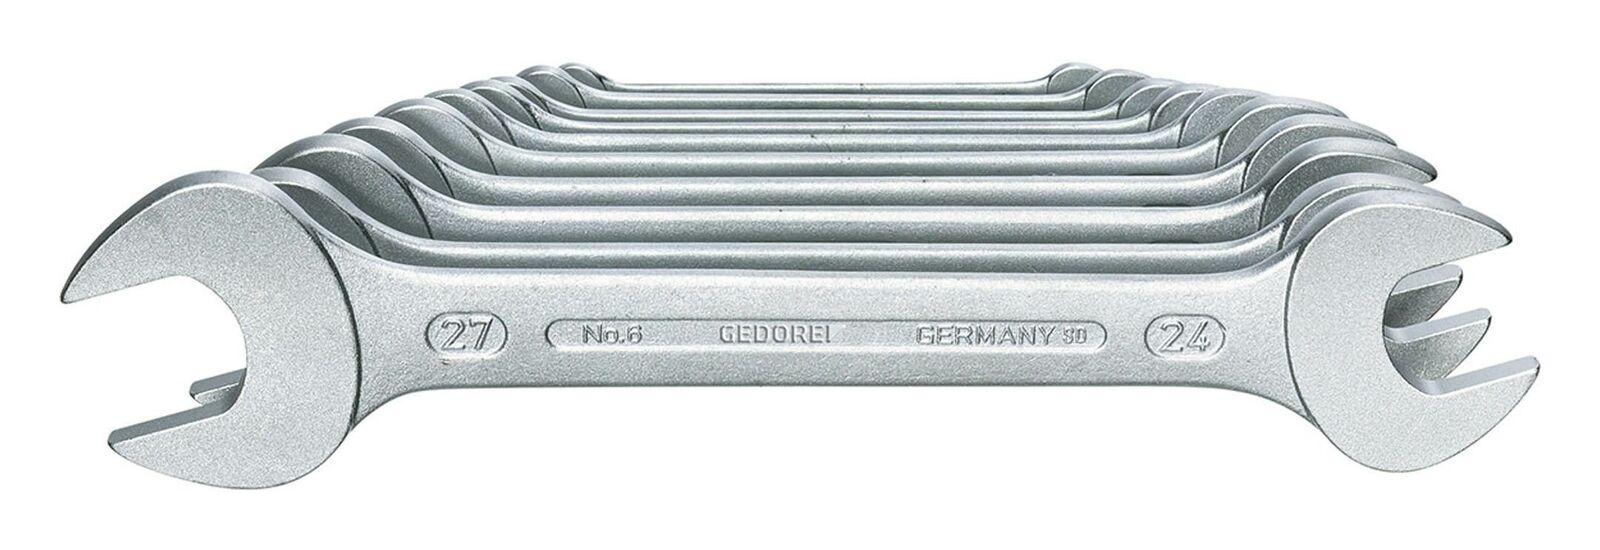 Gedore Doppelmaulschlüssel-Satz D3110 10tlg. 6 - 27mm - 6077540